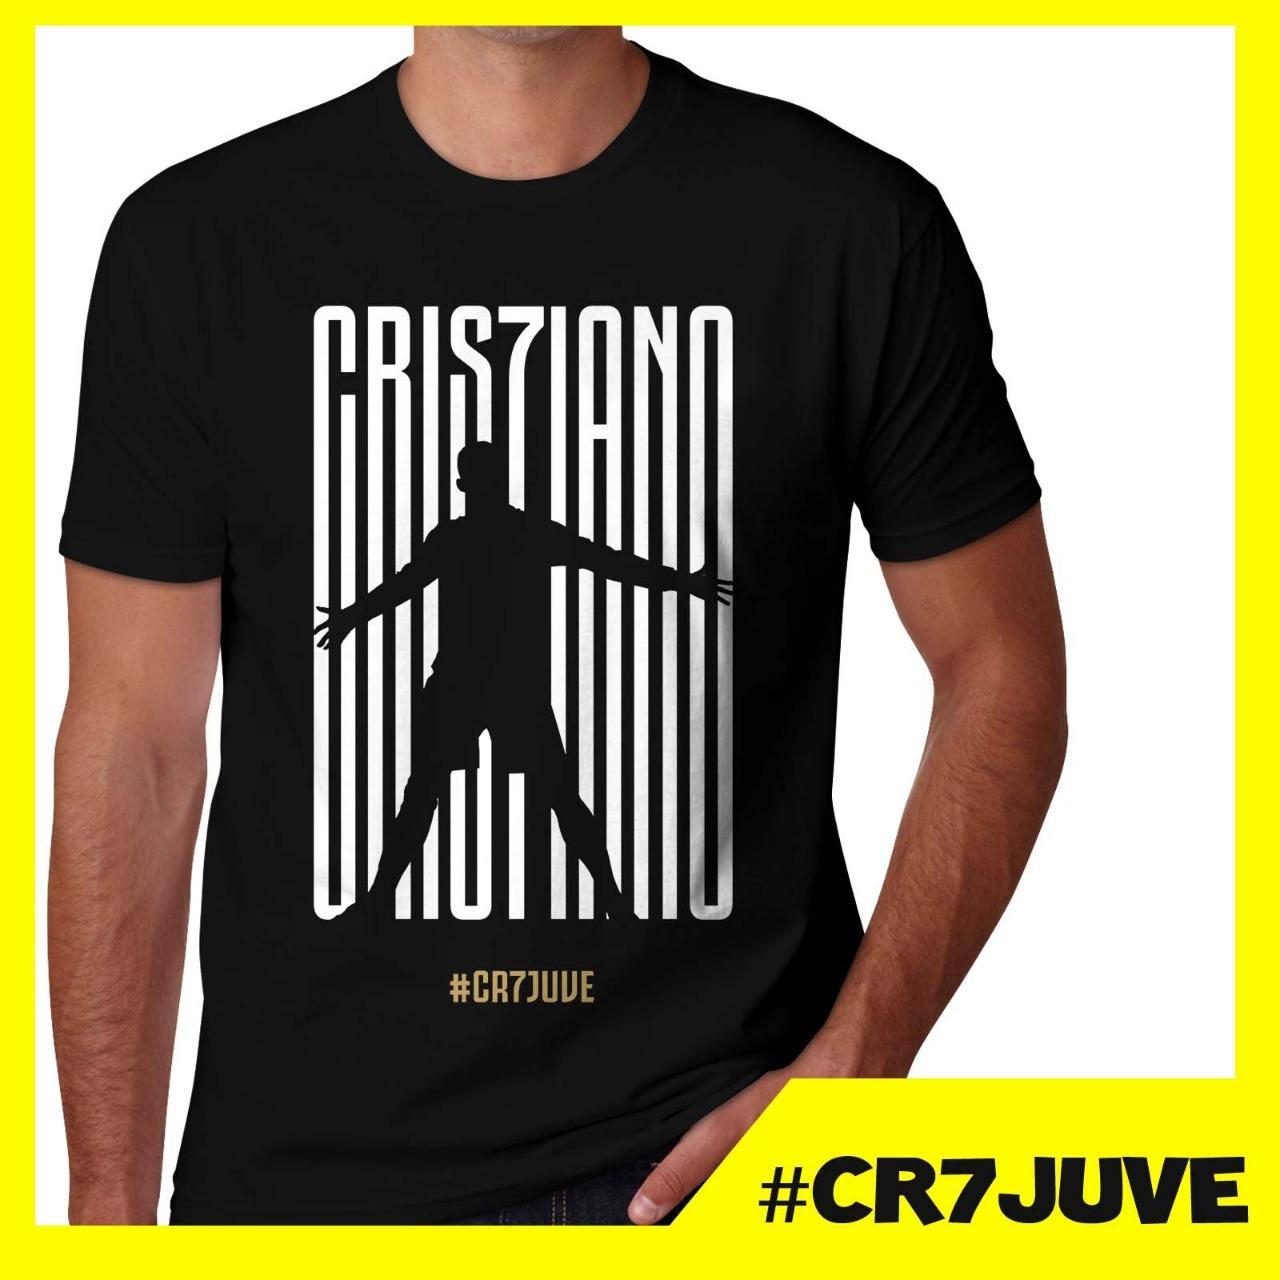 Kaos Ronaldo Juventus CR7JUVE CR7UVE Baju Distro Juve Bola Liga Italia - MDF STORE